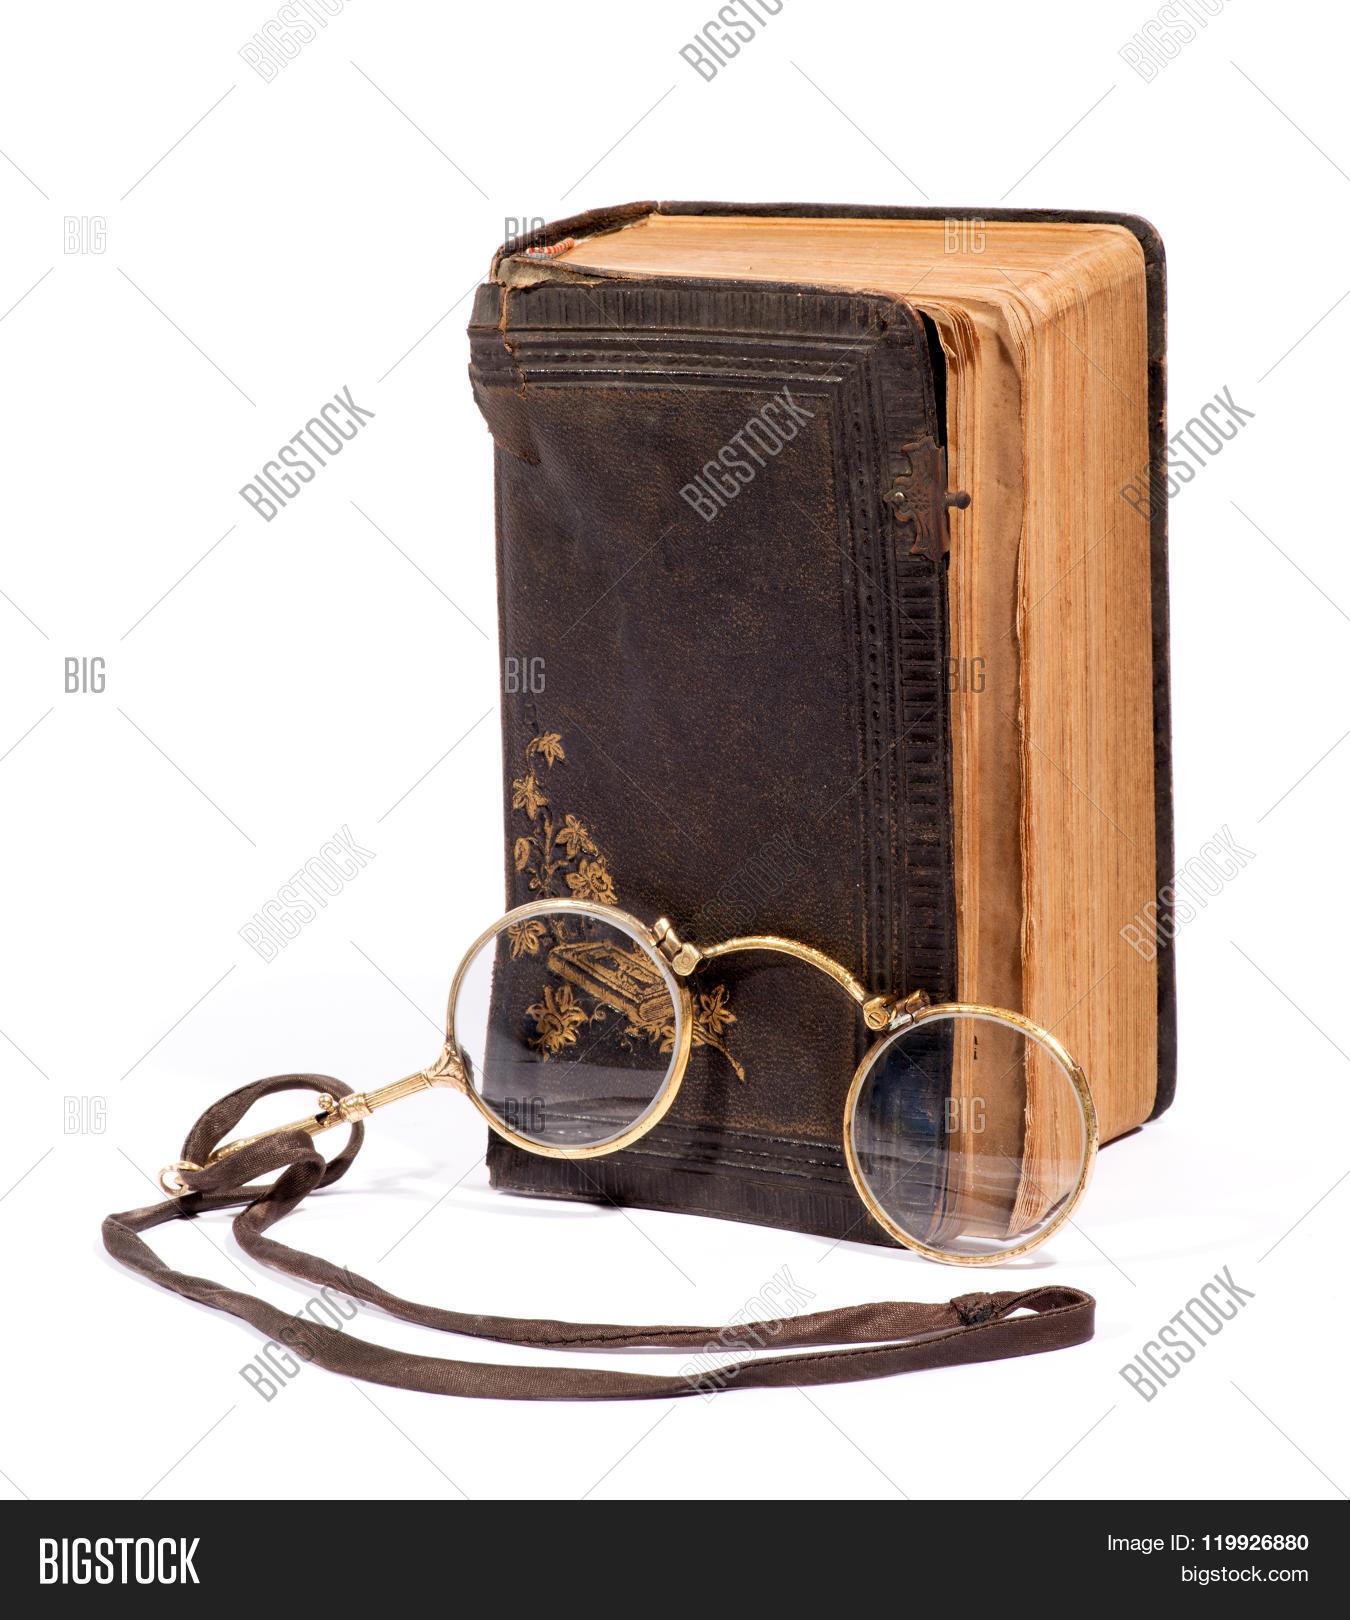 antique,book,bygones,collectible,eyeglasses,eyesight,glasses,isolated,leather,optical,pince-nez,reading,vintage,vision,worn